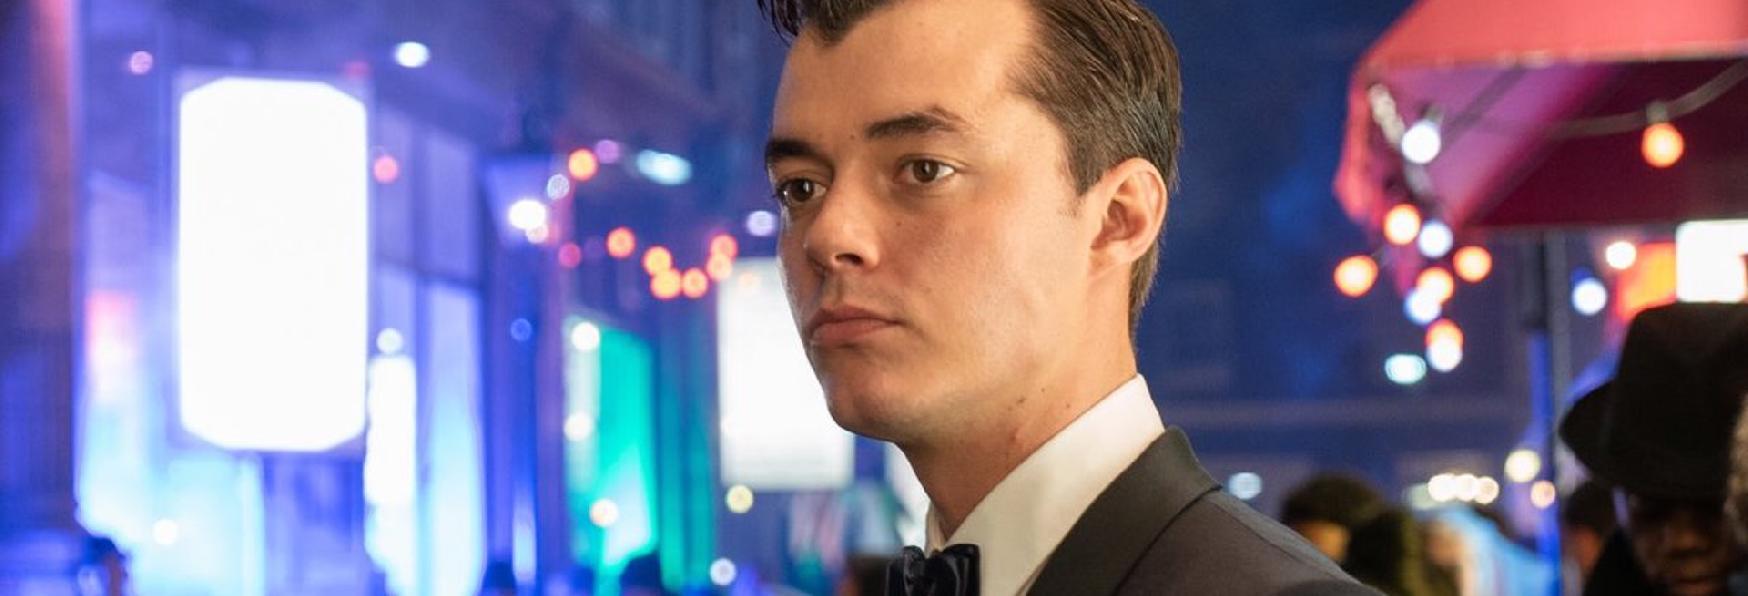 Rilasciato un nuovo Trailer di Pennyworth, con protagonista Thomas Wayne